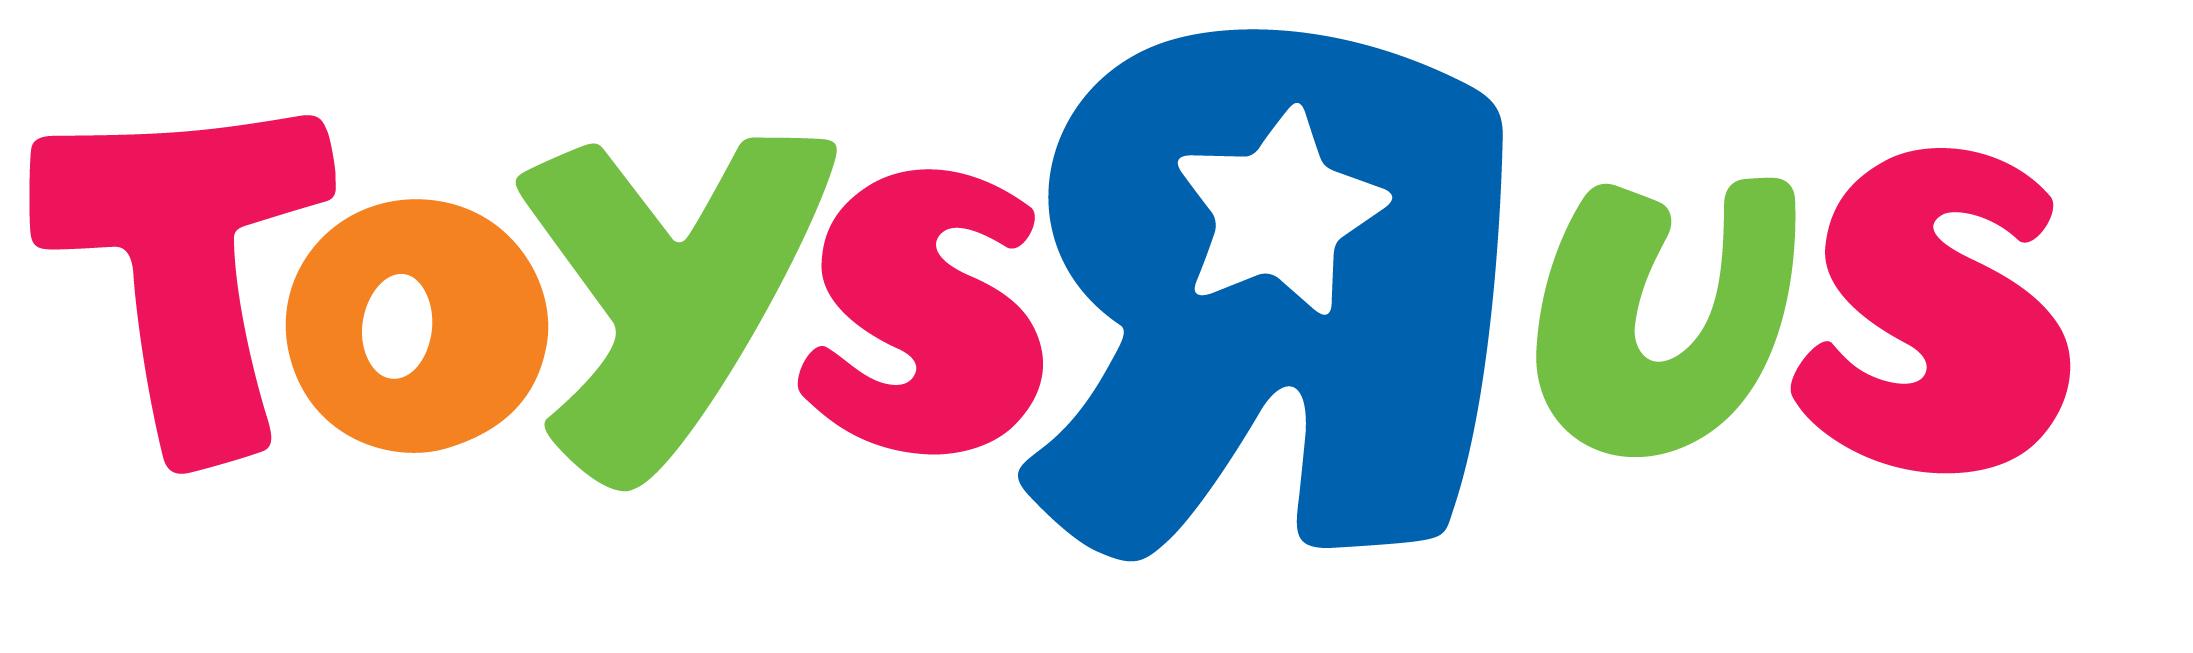 Toysurus_logo